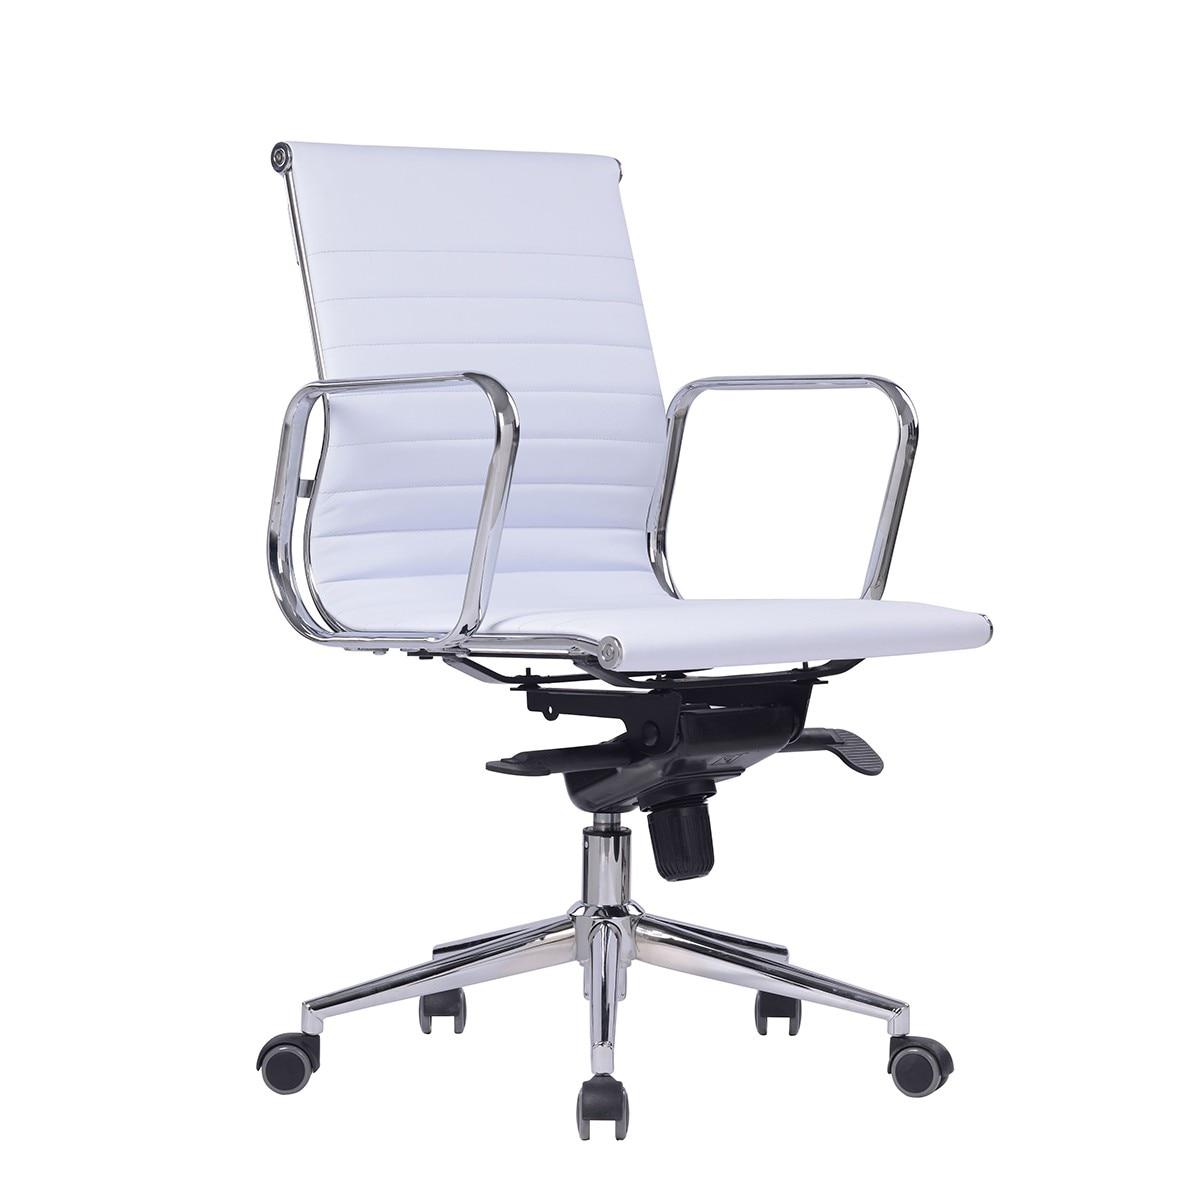 Office Armchair ARKANSAS, Rotatable, Similpiel White